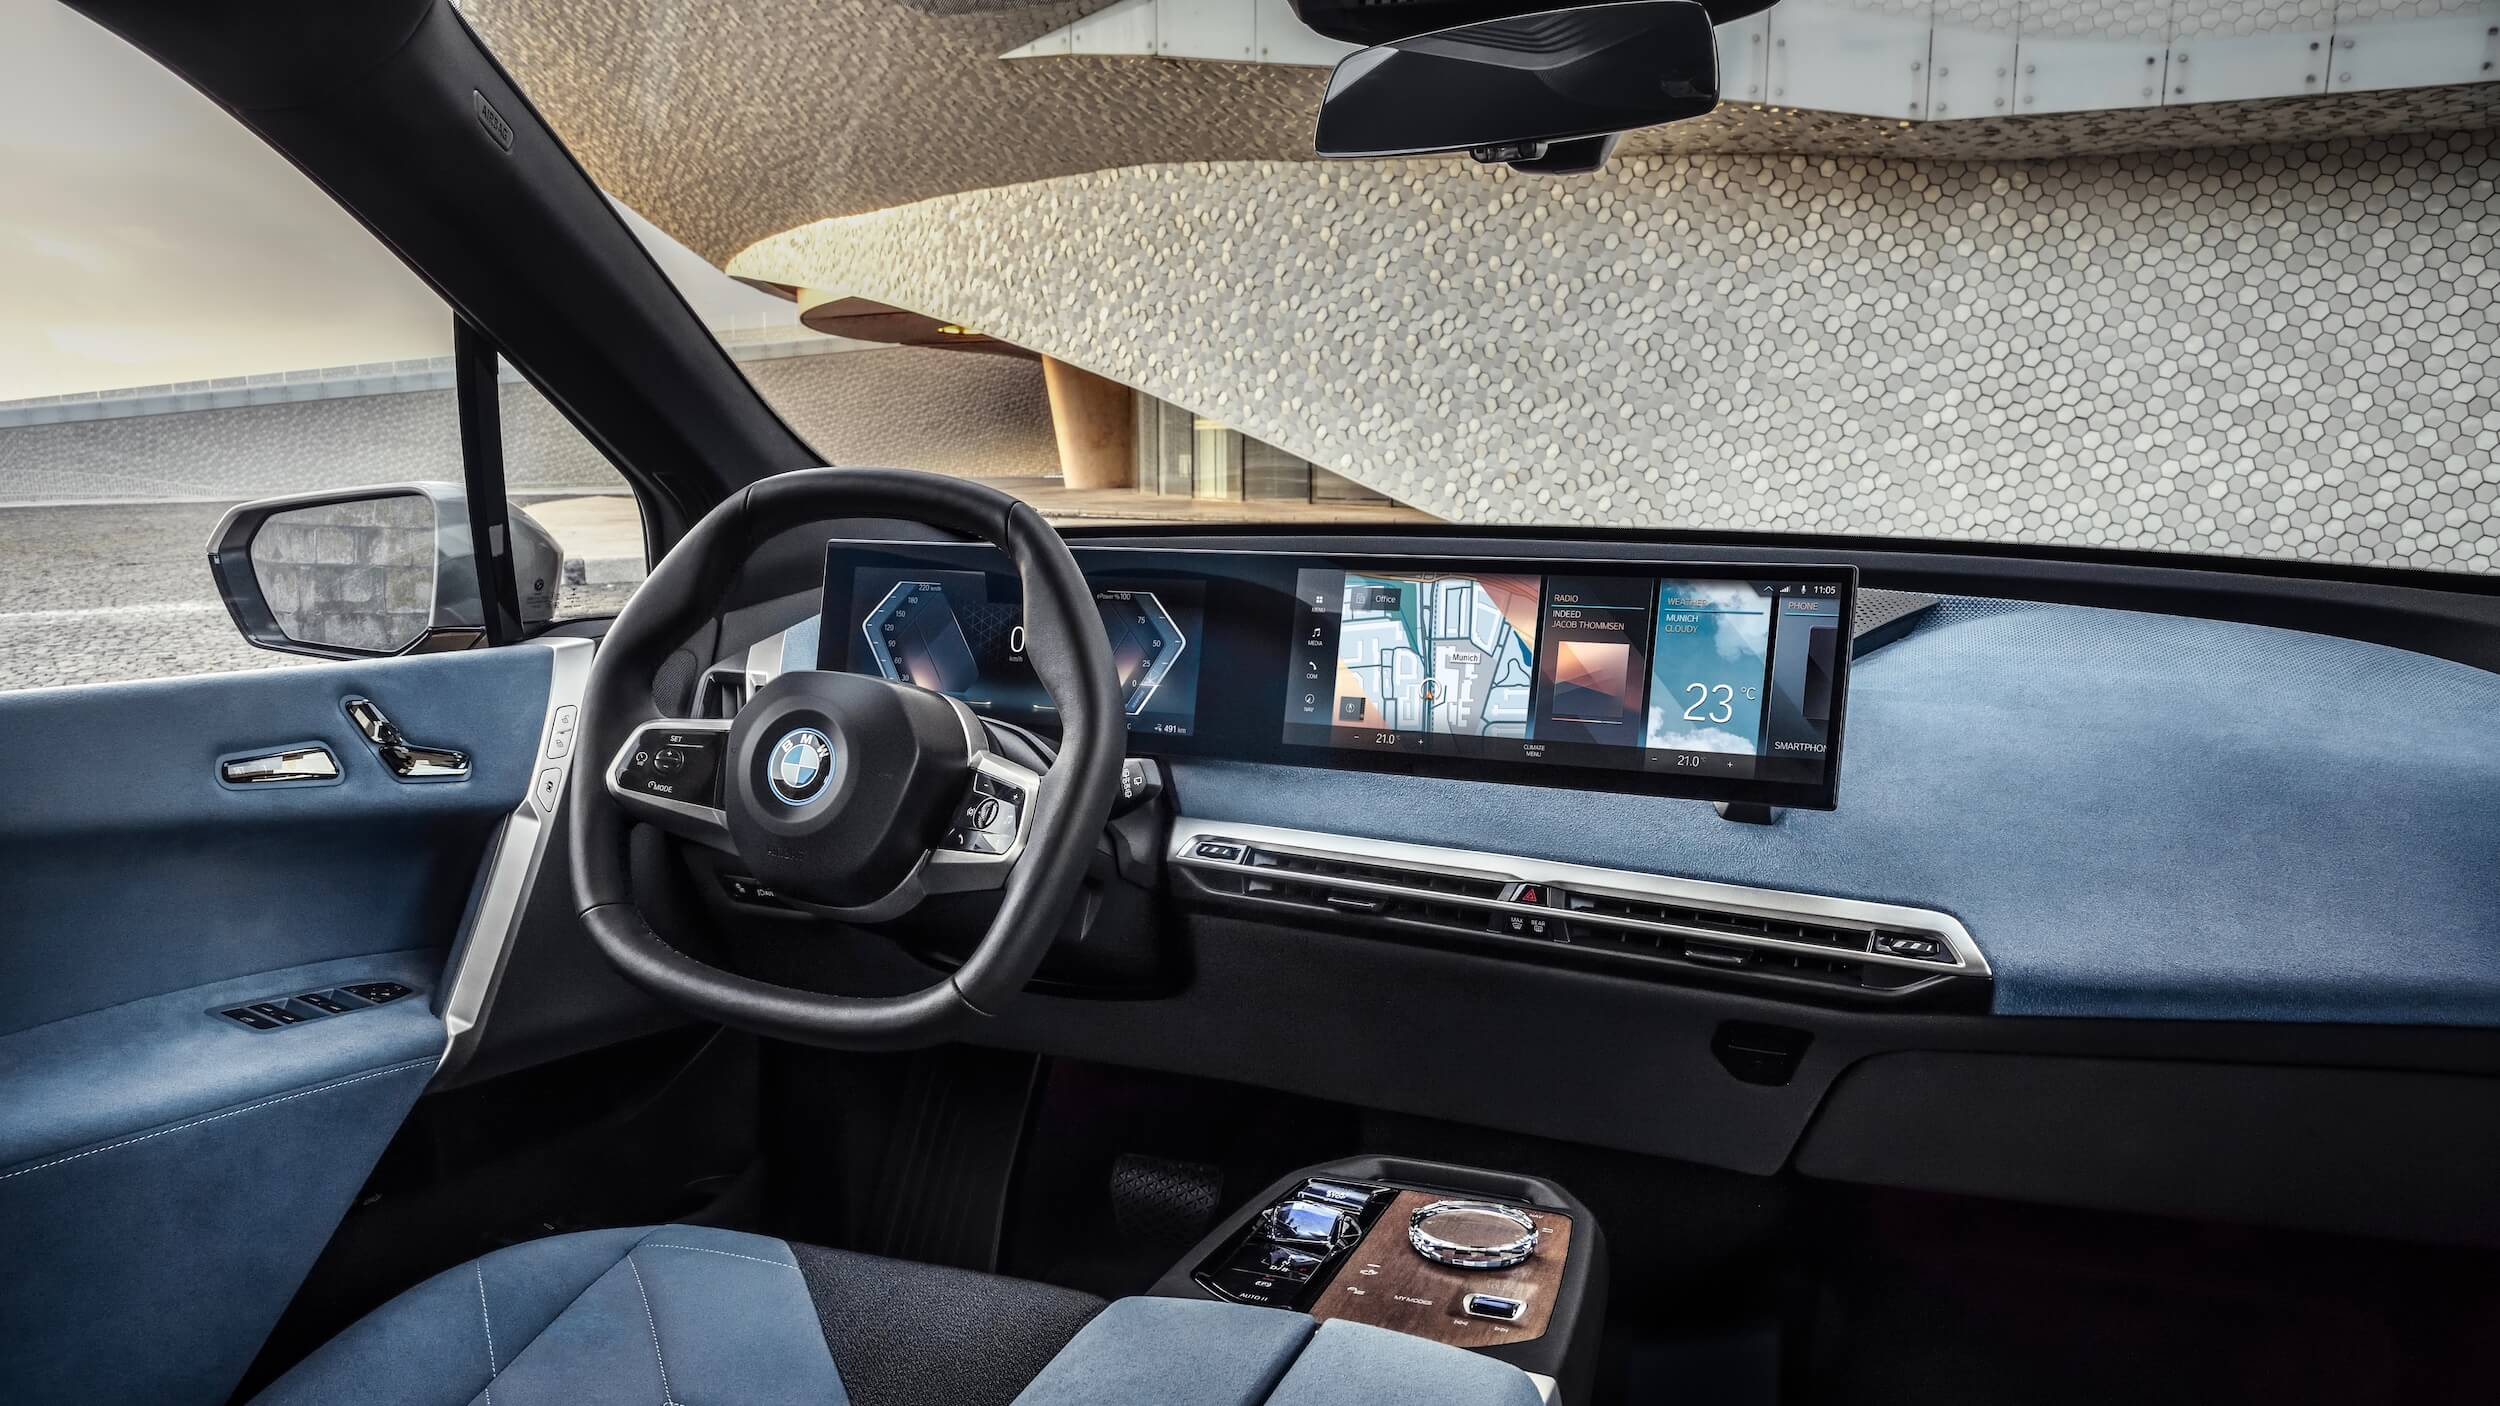 BMW iX interior 1